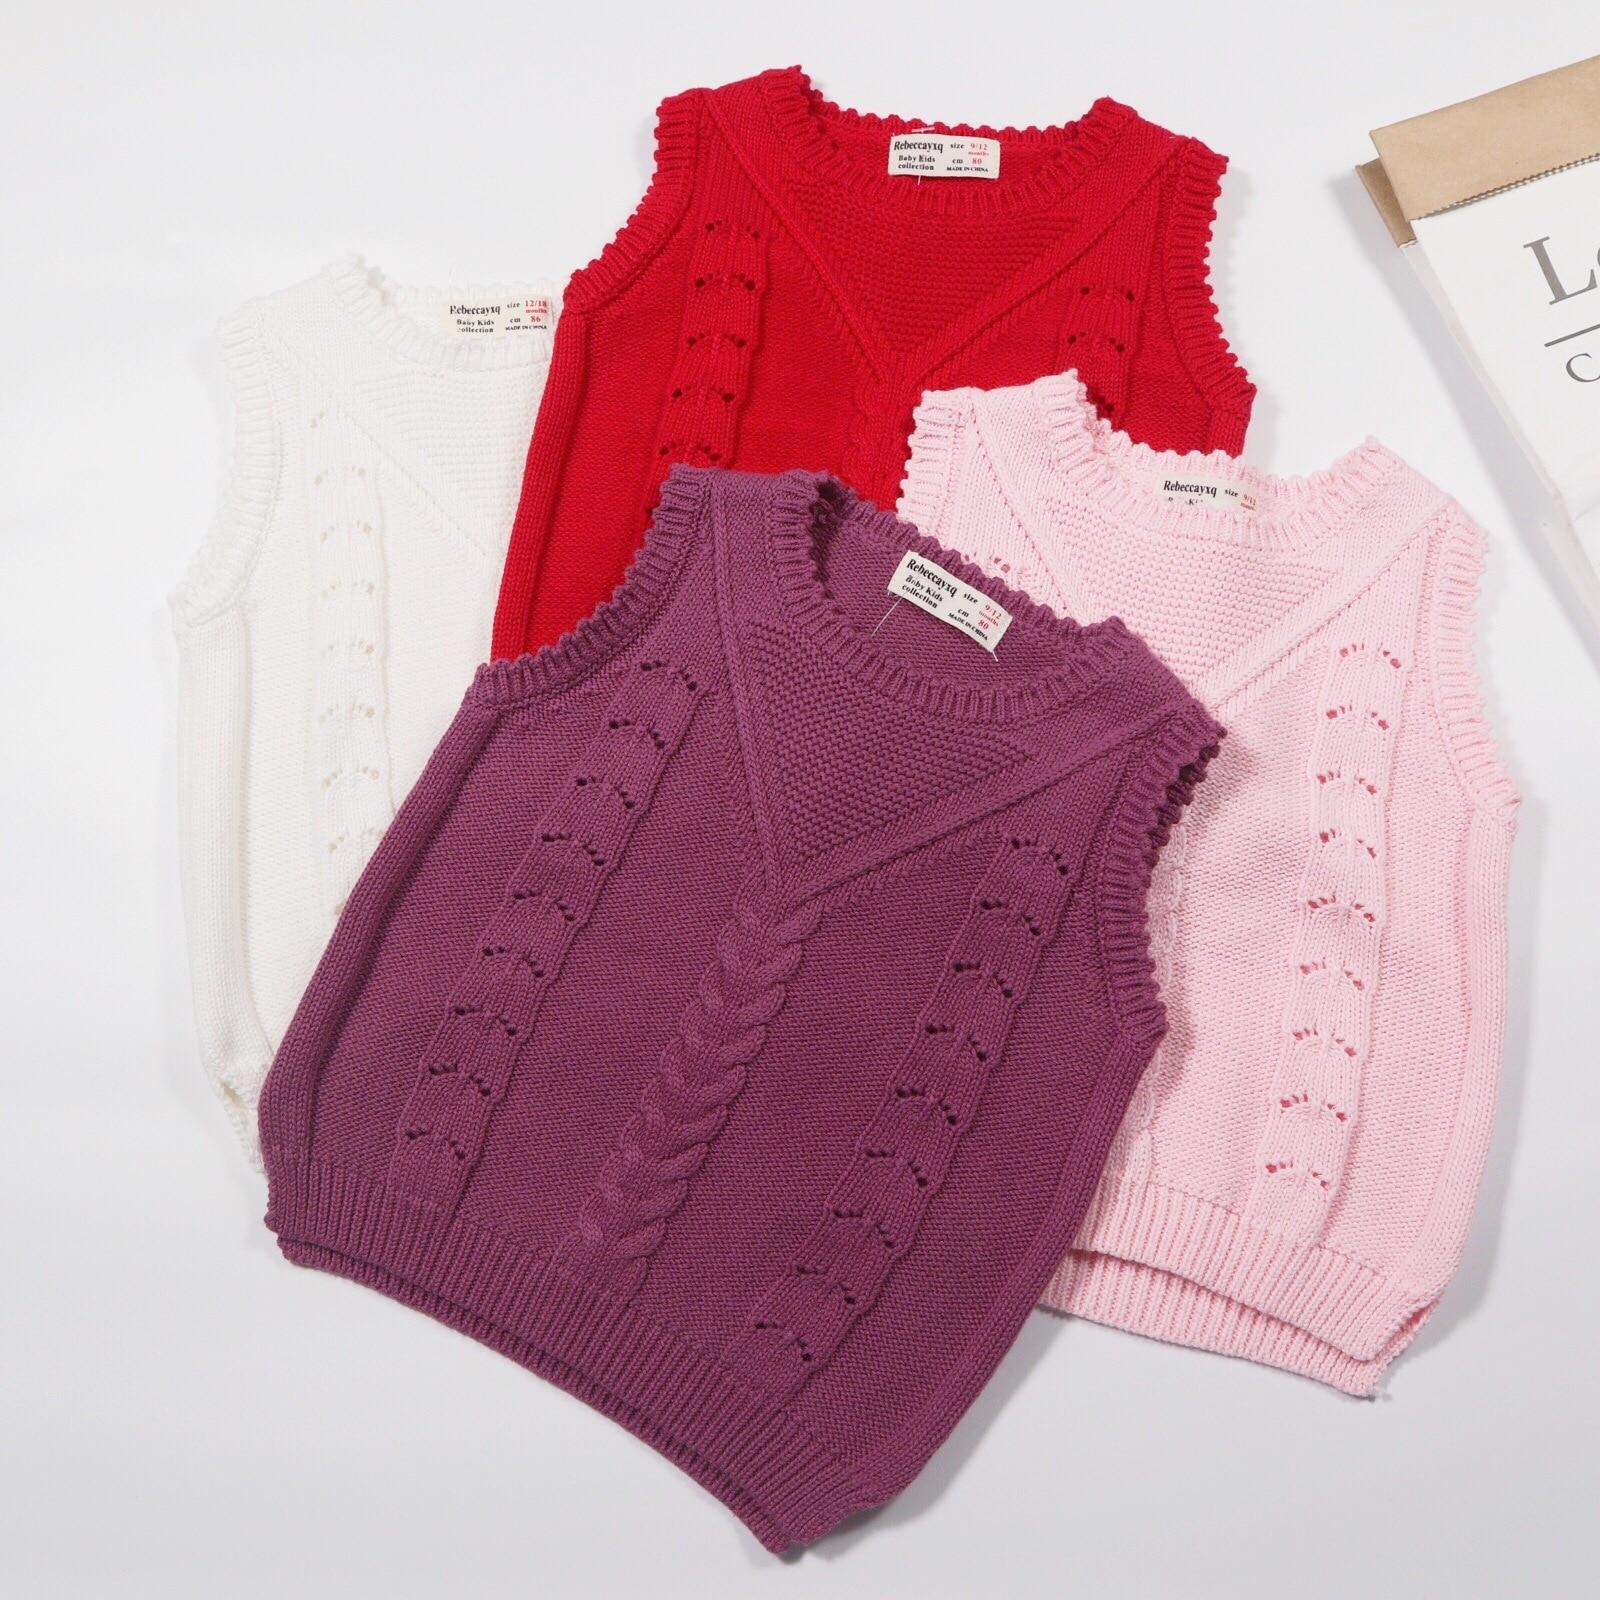 CHILDREN'S Sweater-2019 Infant Sweater Children Knitted Sweater Vest